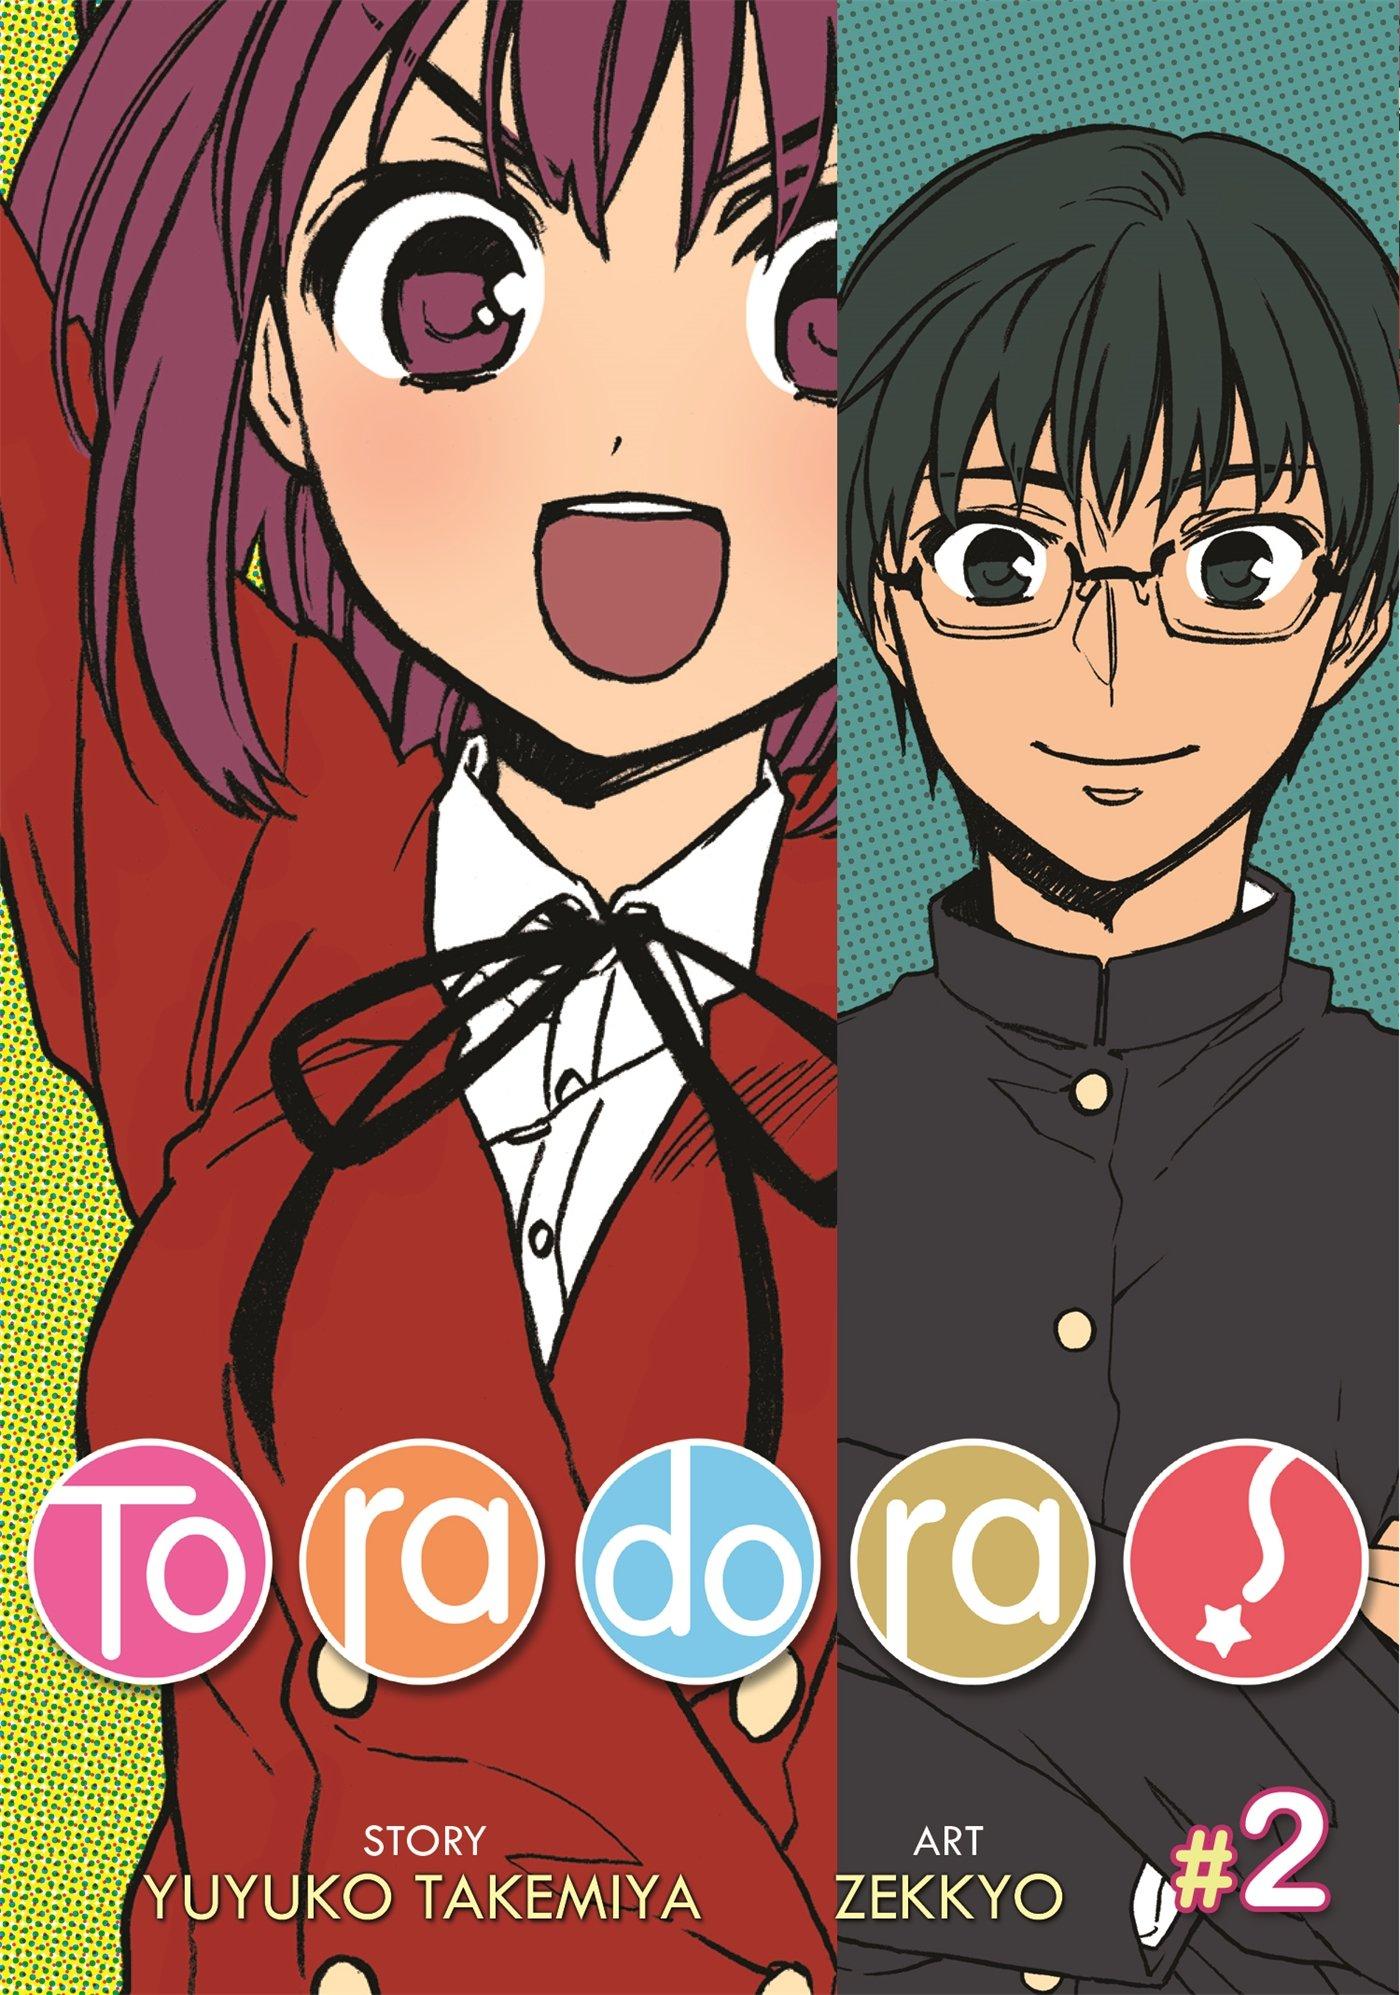 Download Toradora! Vol. 2 ebook